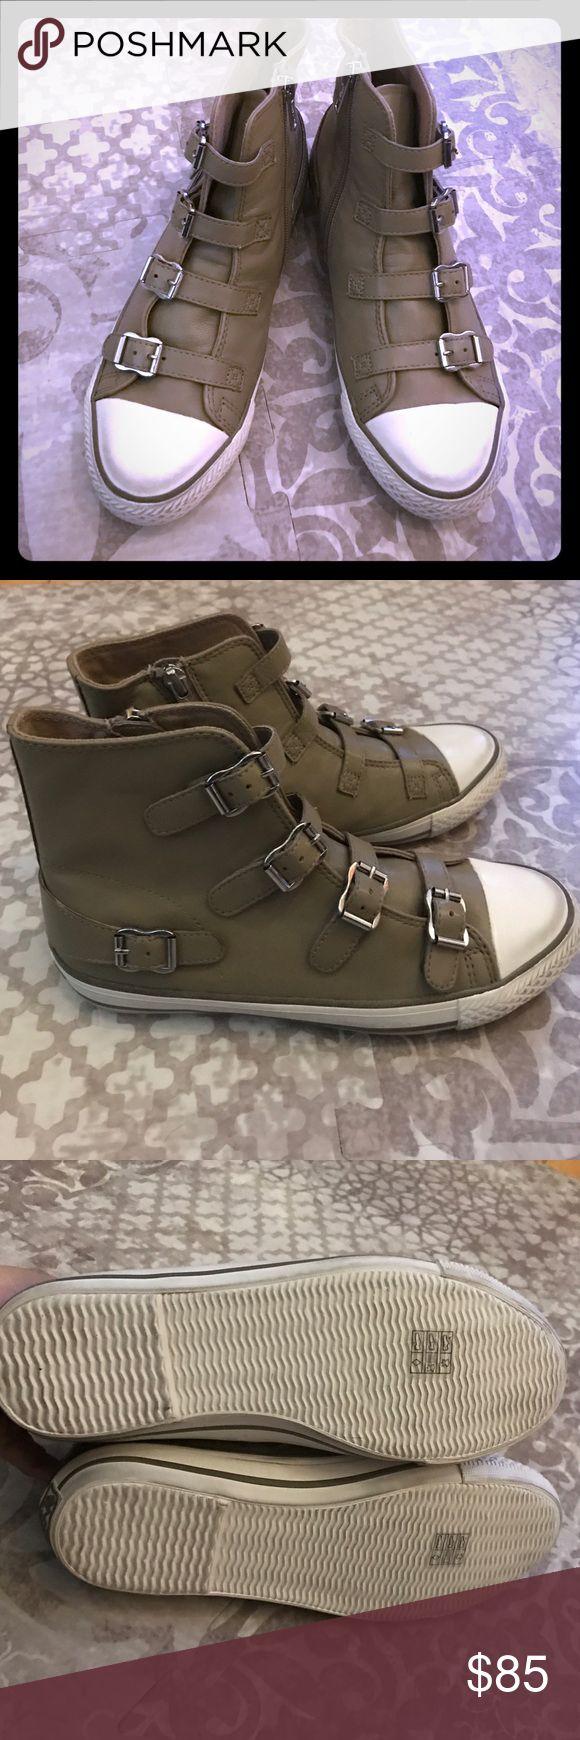 Never worn new ash sneakers genial high top shoes Cute edgy ash sneakers tan never worn Ash Shoes Sneakers